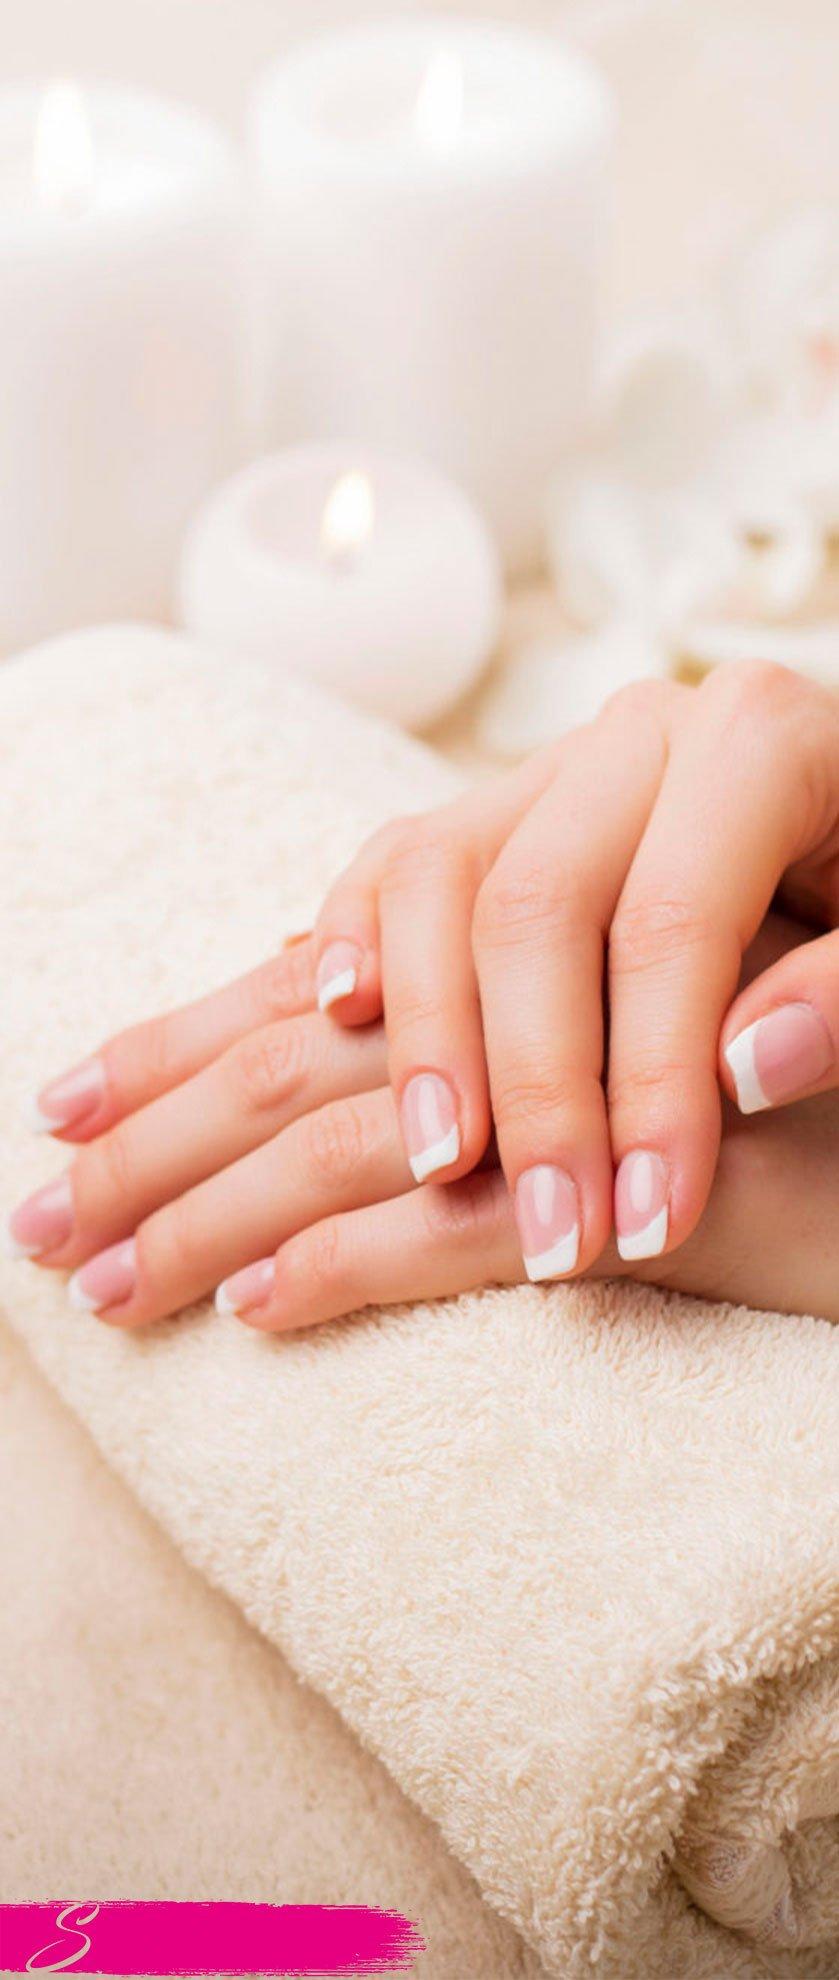 estetista sensazione manicure pedicure